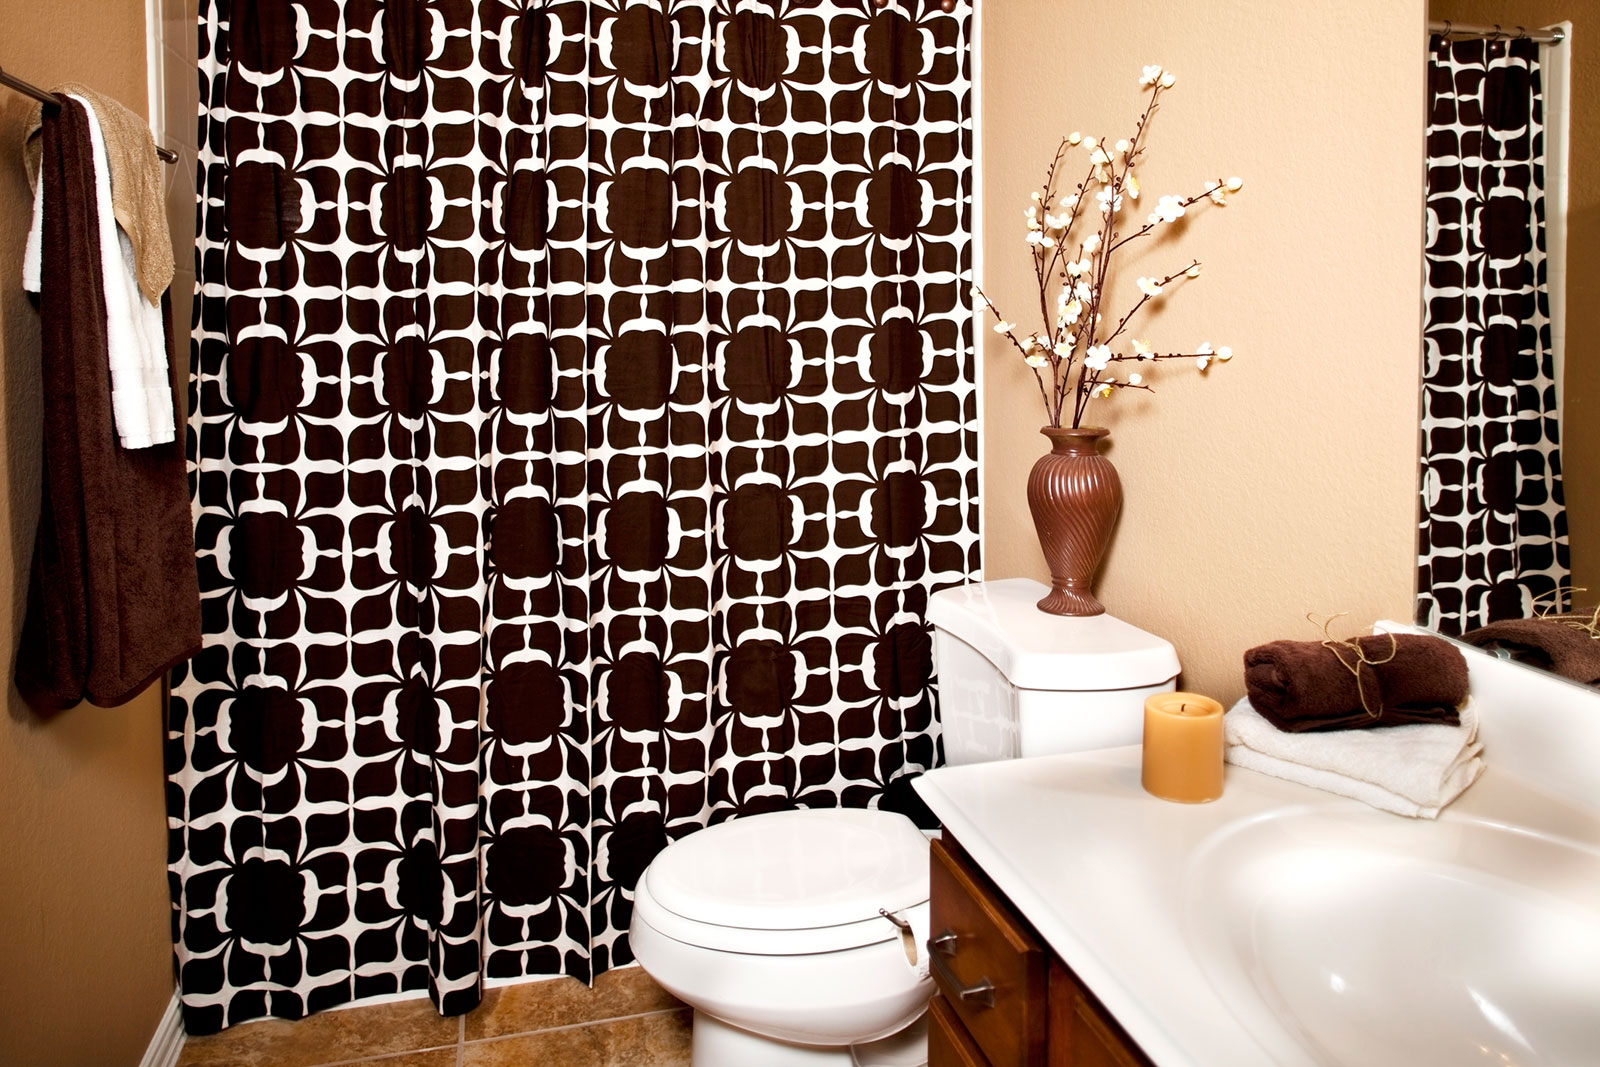 Long shower curtain liner 96 - Long Shower Curtain Liner 96 33